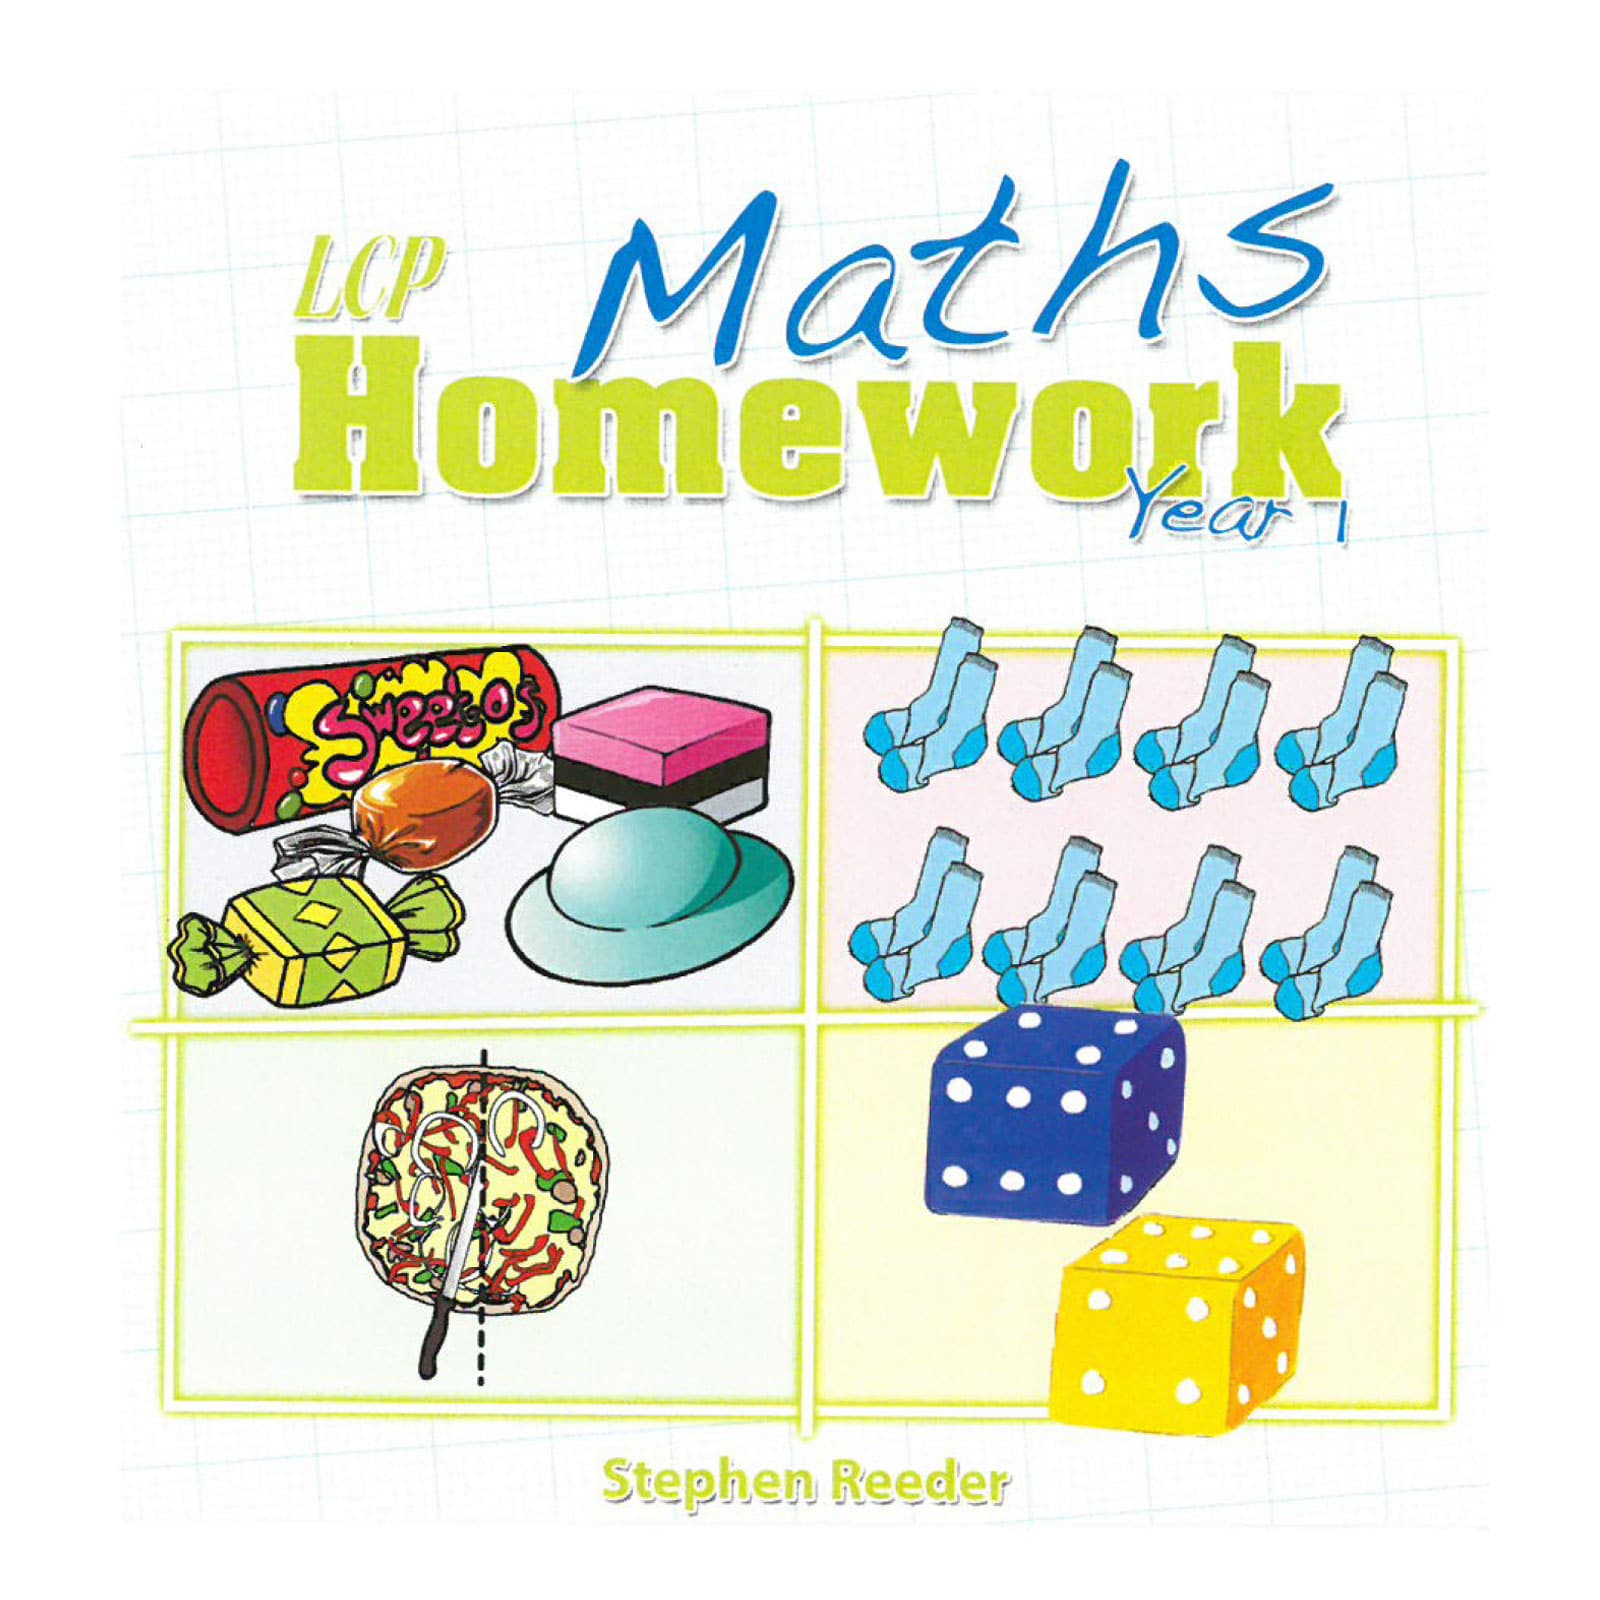 maths homework year 1